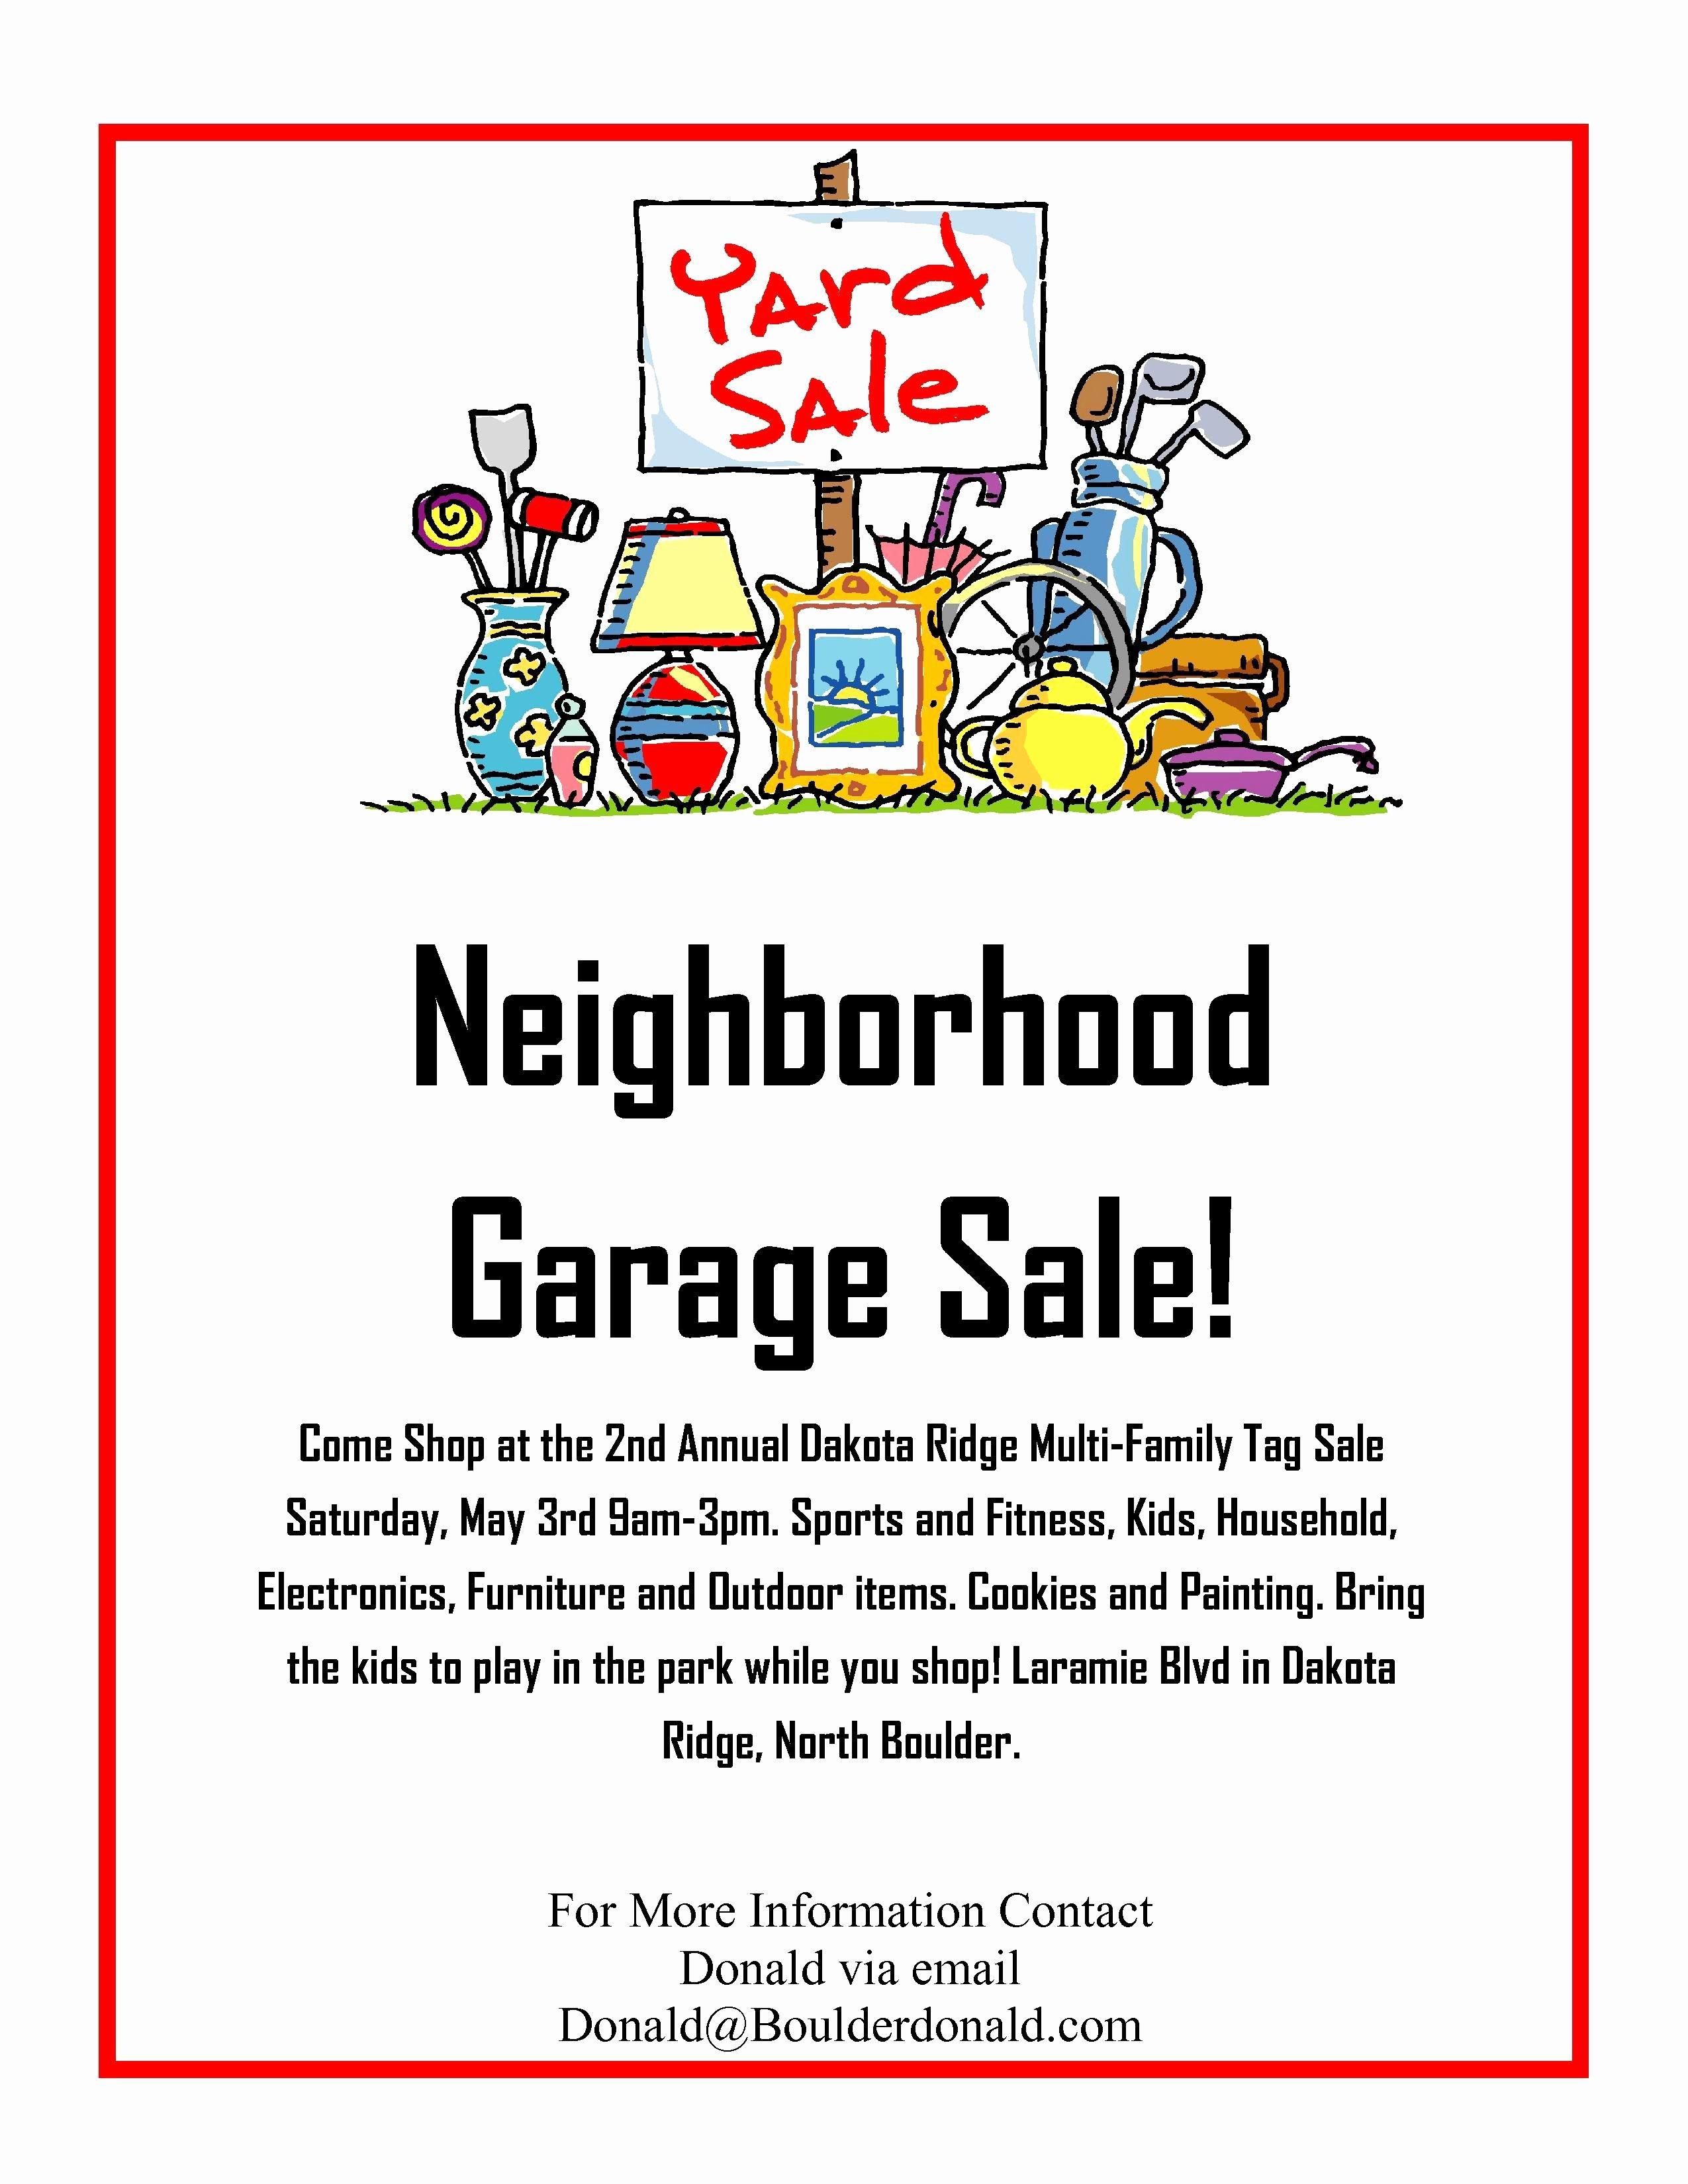 Sales Flyer Template Word Best Of Dakota Ridge Munity Garage Sale May 3rd 2014